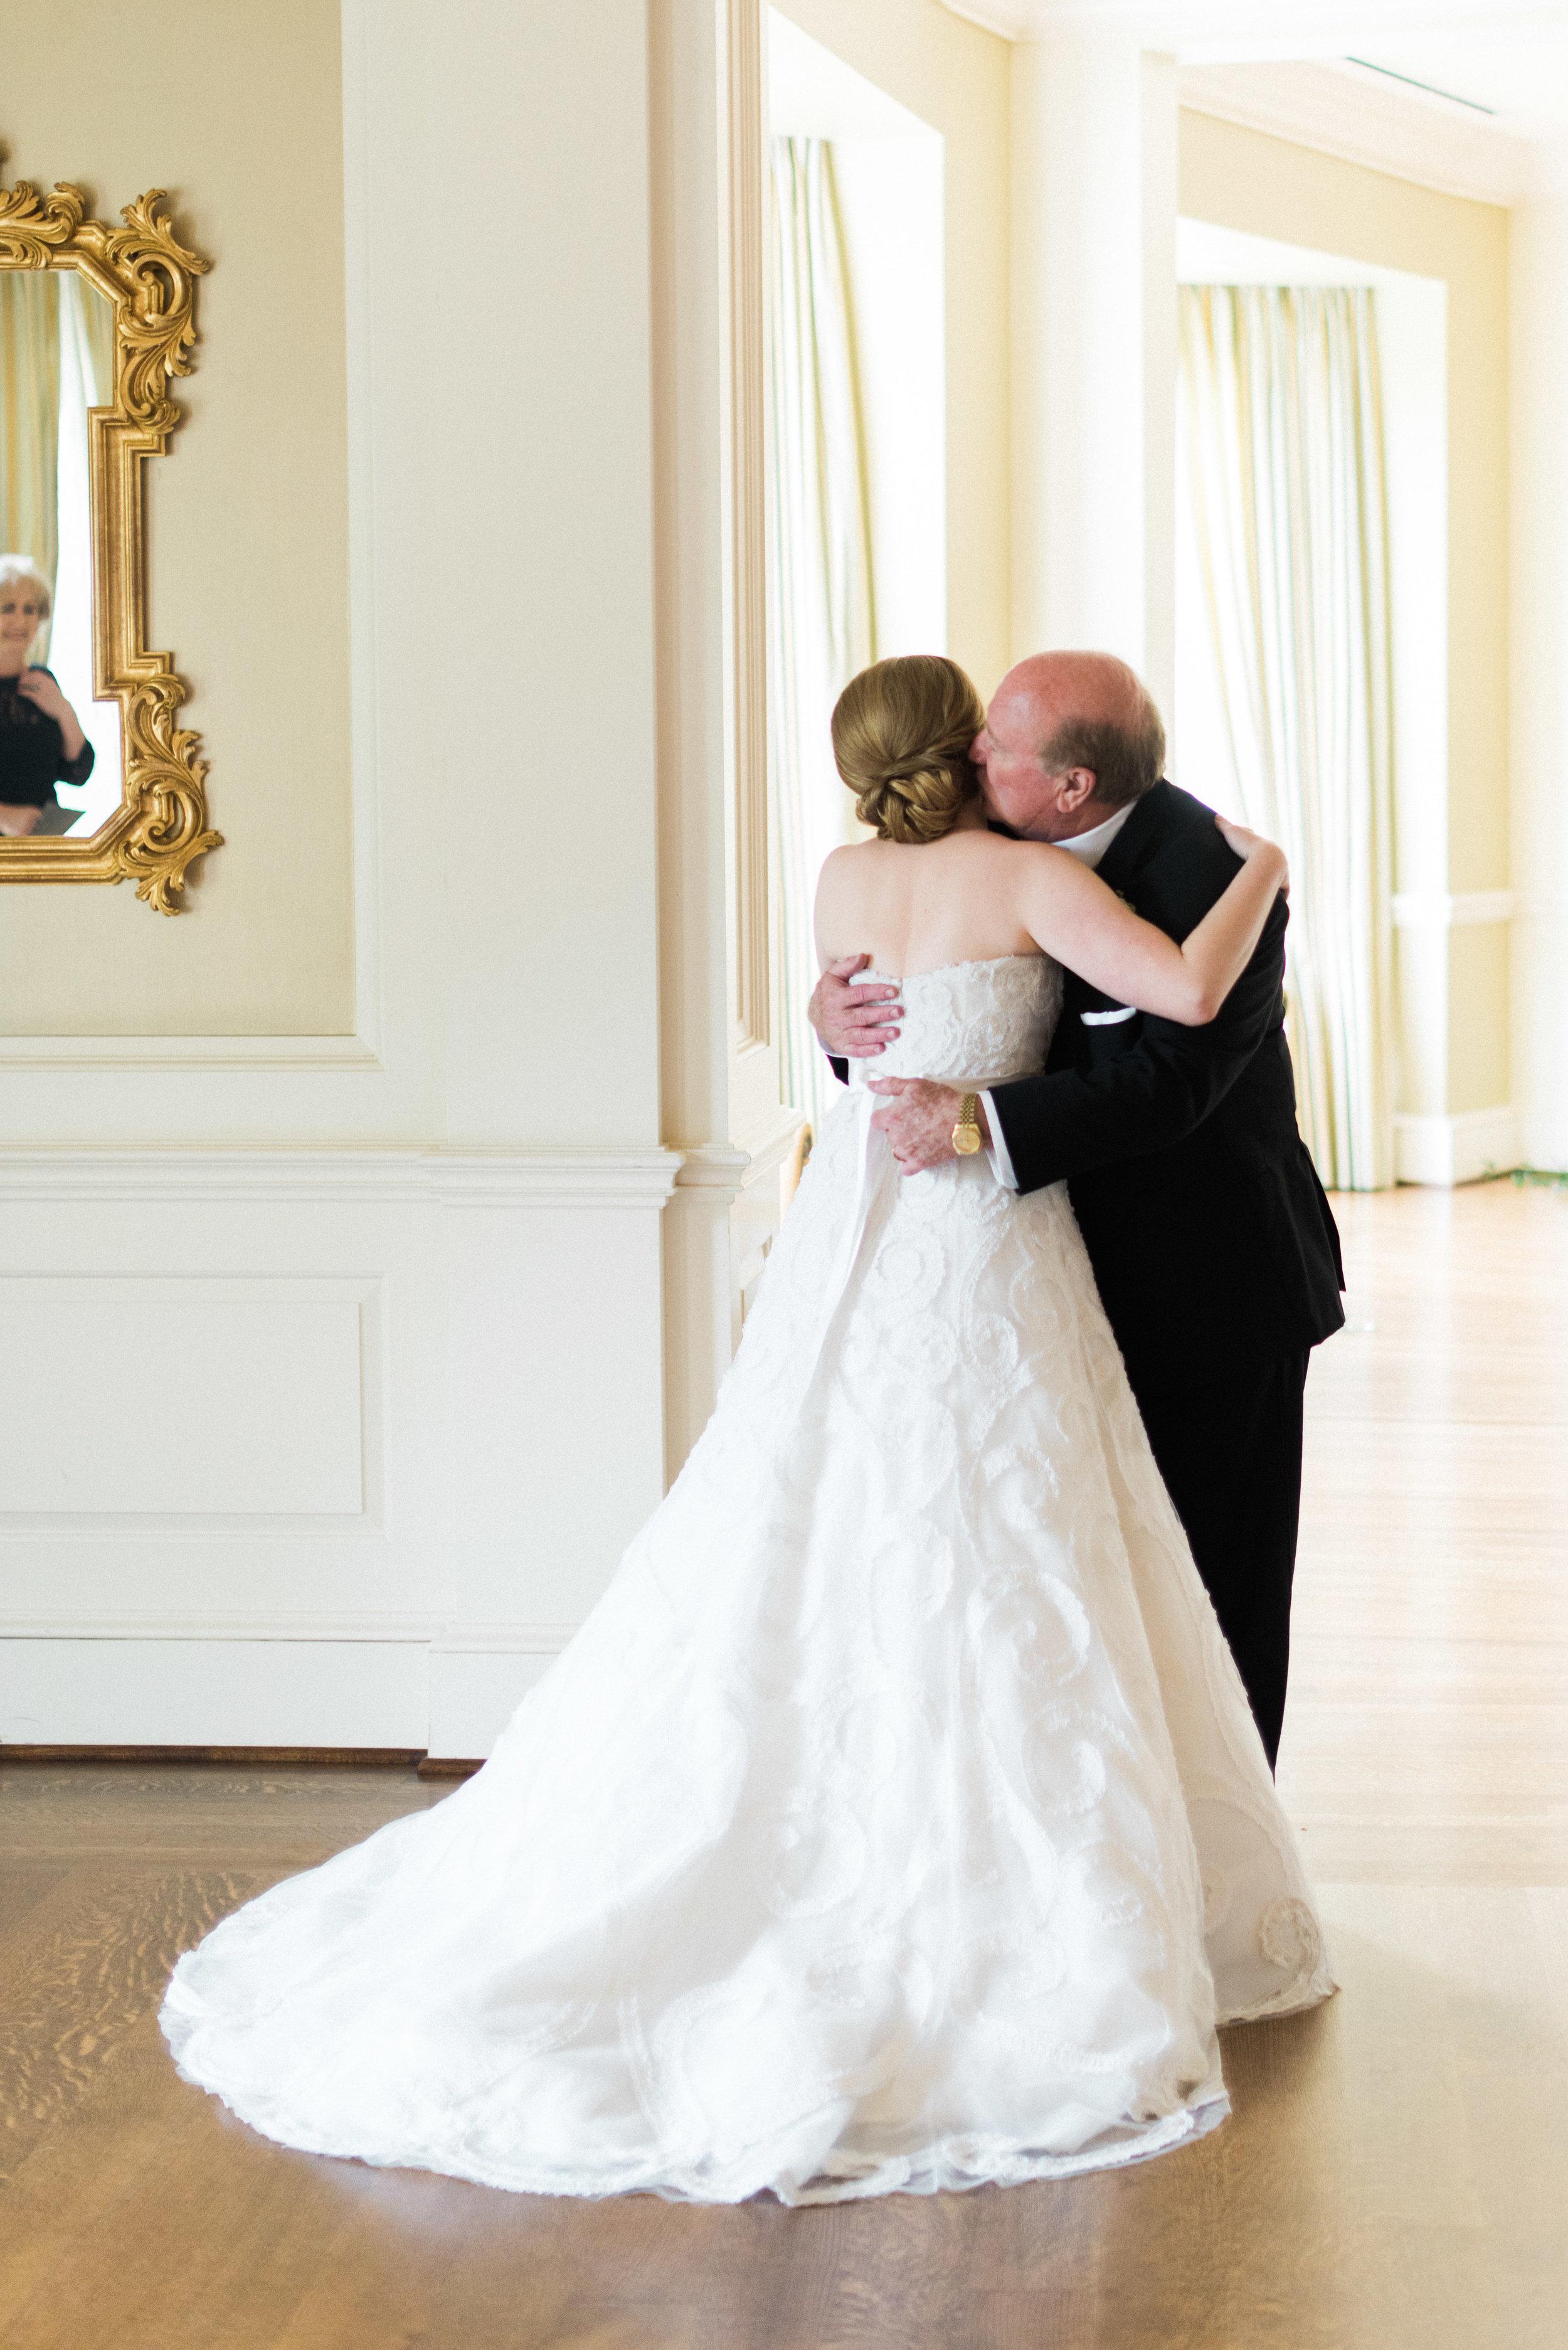 Fine-Art-Film-Houston-Wedding-Photographer-Best-Top-Luxury-Texas-Austin-Dallas-Destination-Dana-Fernandez-Photography-River-Oaks-Country-Club-South-Main-Baptist-Ceremony-Reception-Wedding-7.jpg